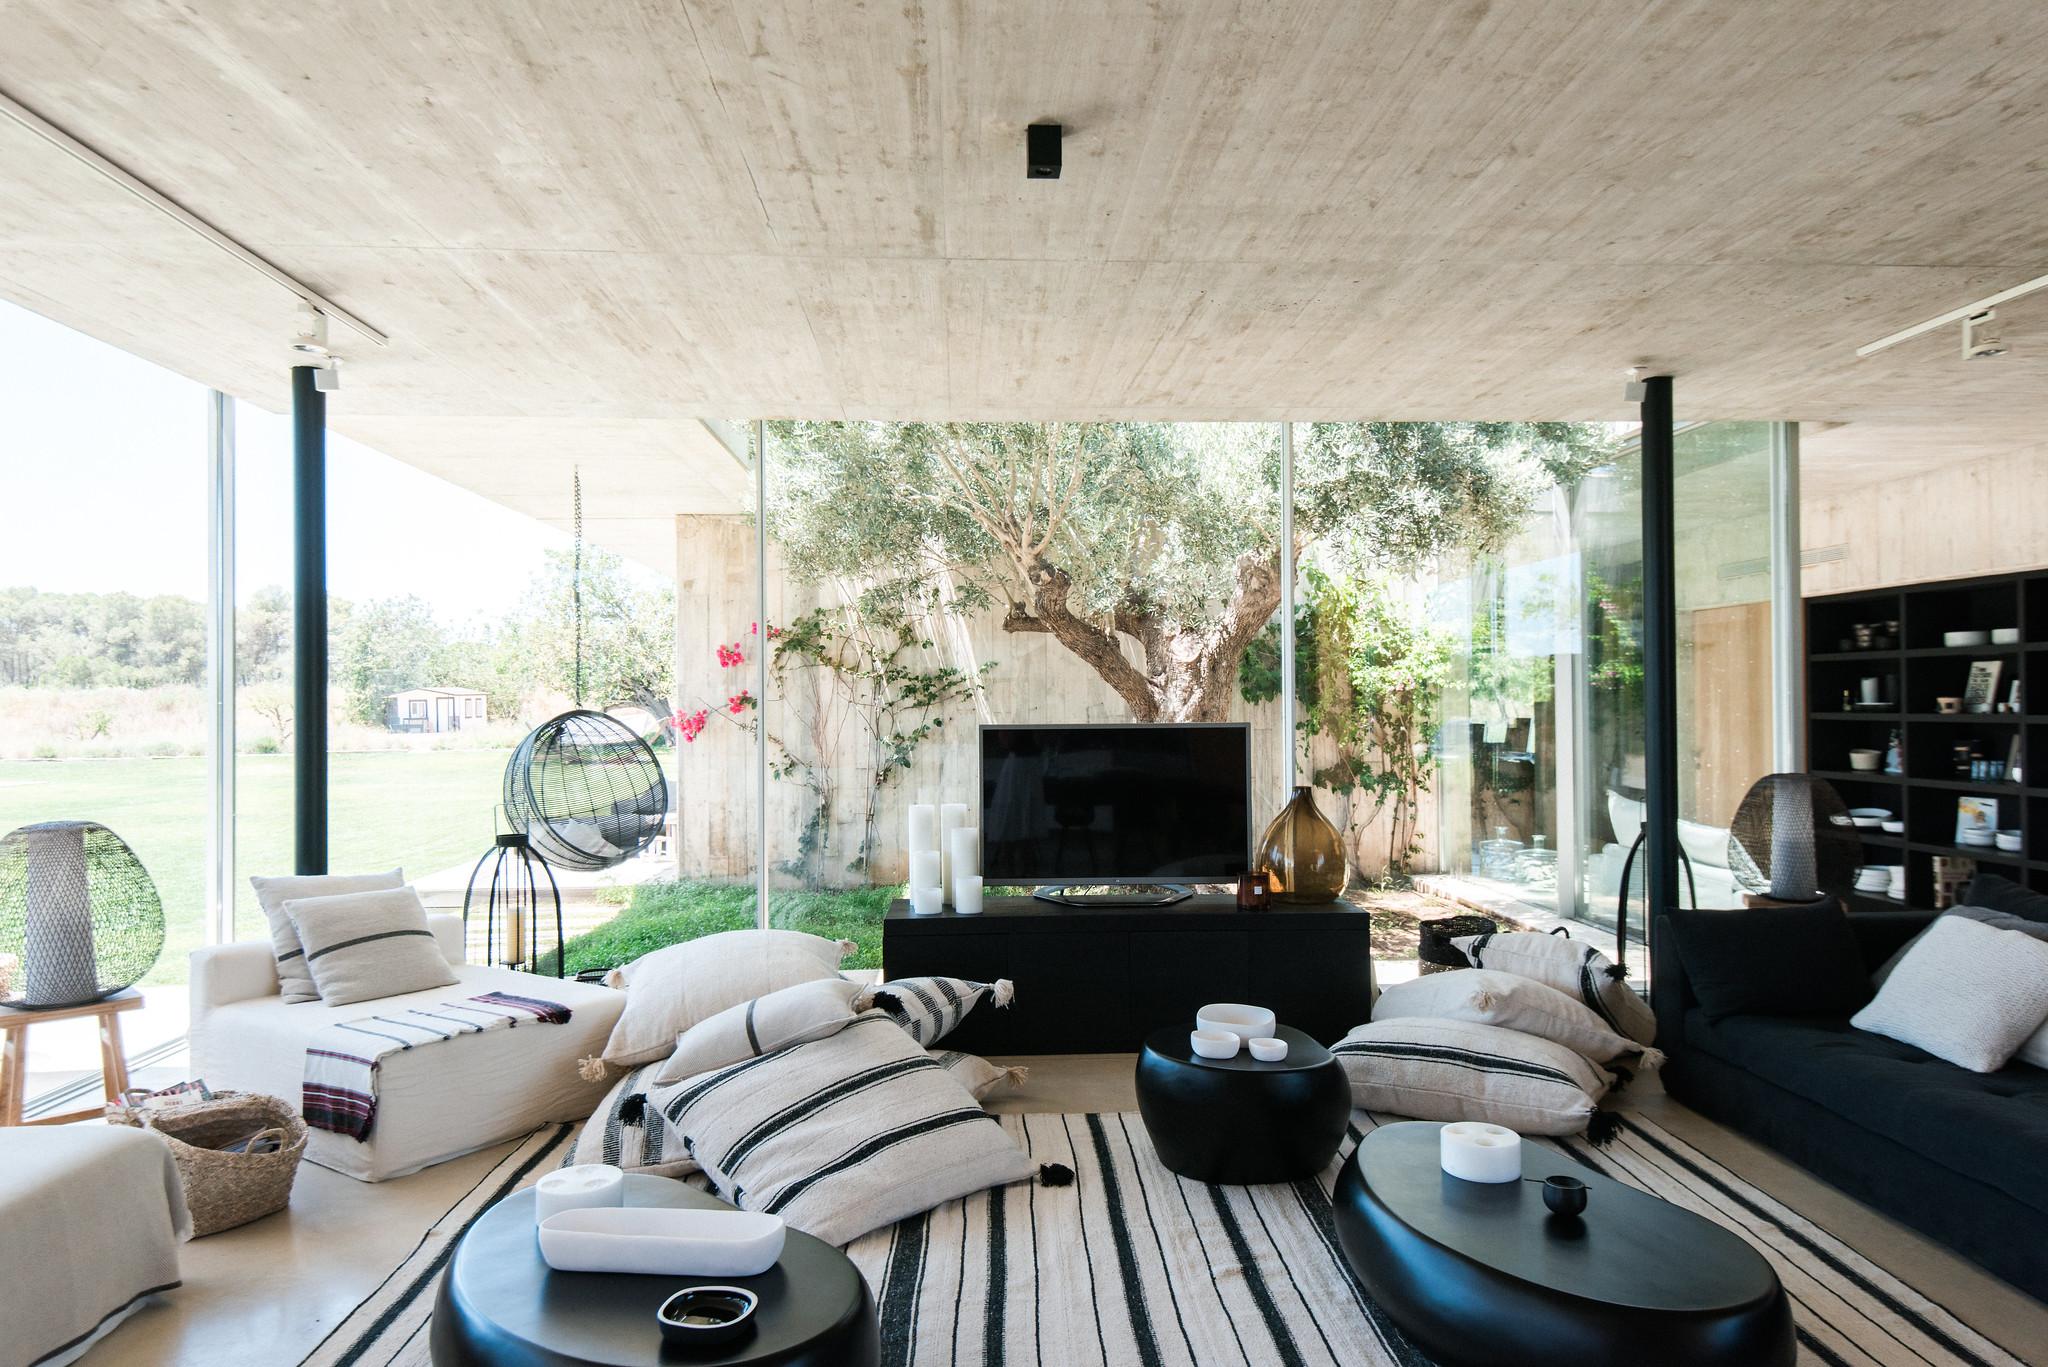 https://www.white-ibiza.com/wp-content/uploads/2020/06/white-ibiza-villas-casa-valentina-interior-living-room.jpg